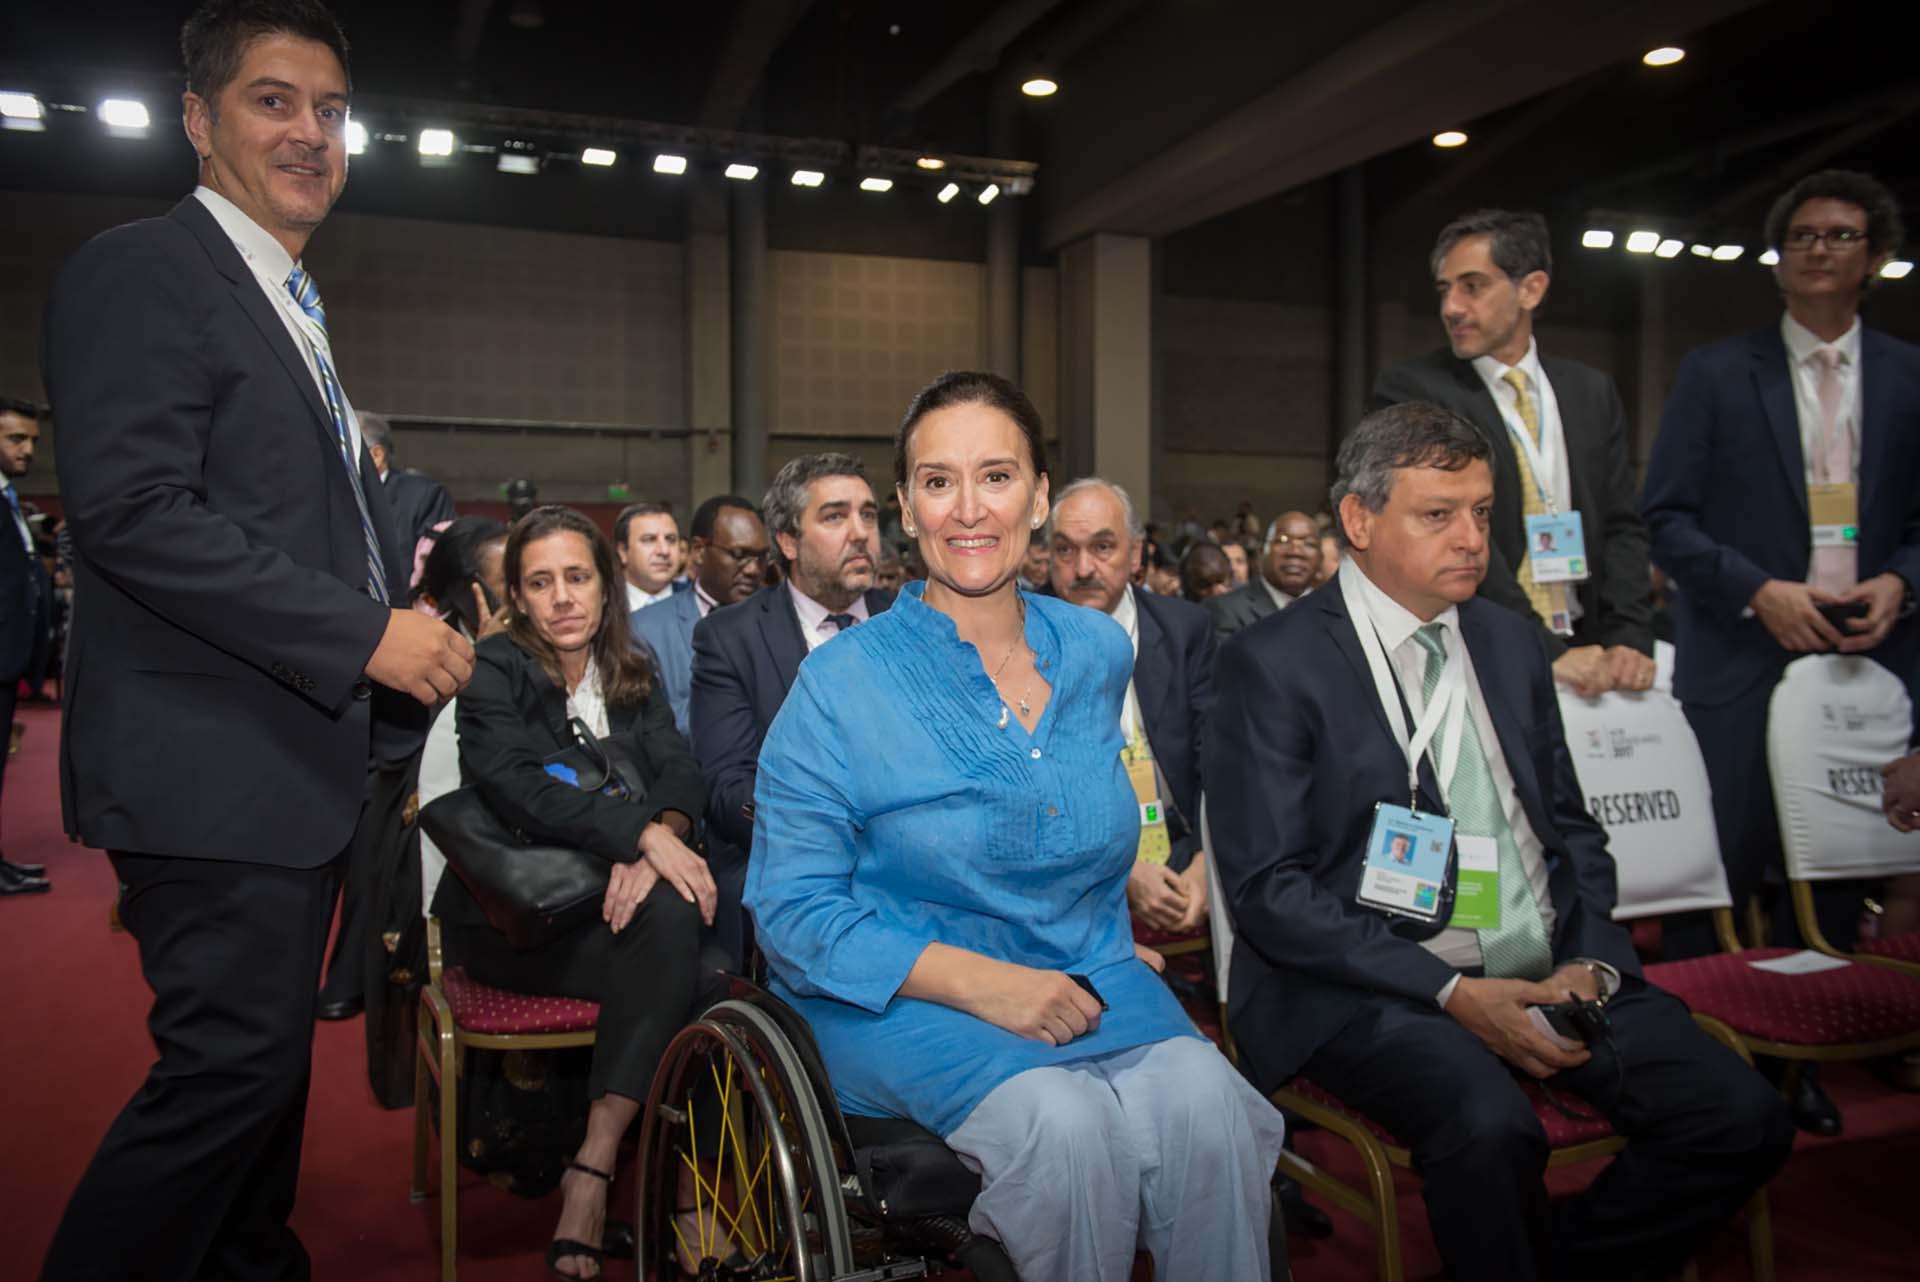 La vicepresidenta de la Nación, Gabriela Michetti